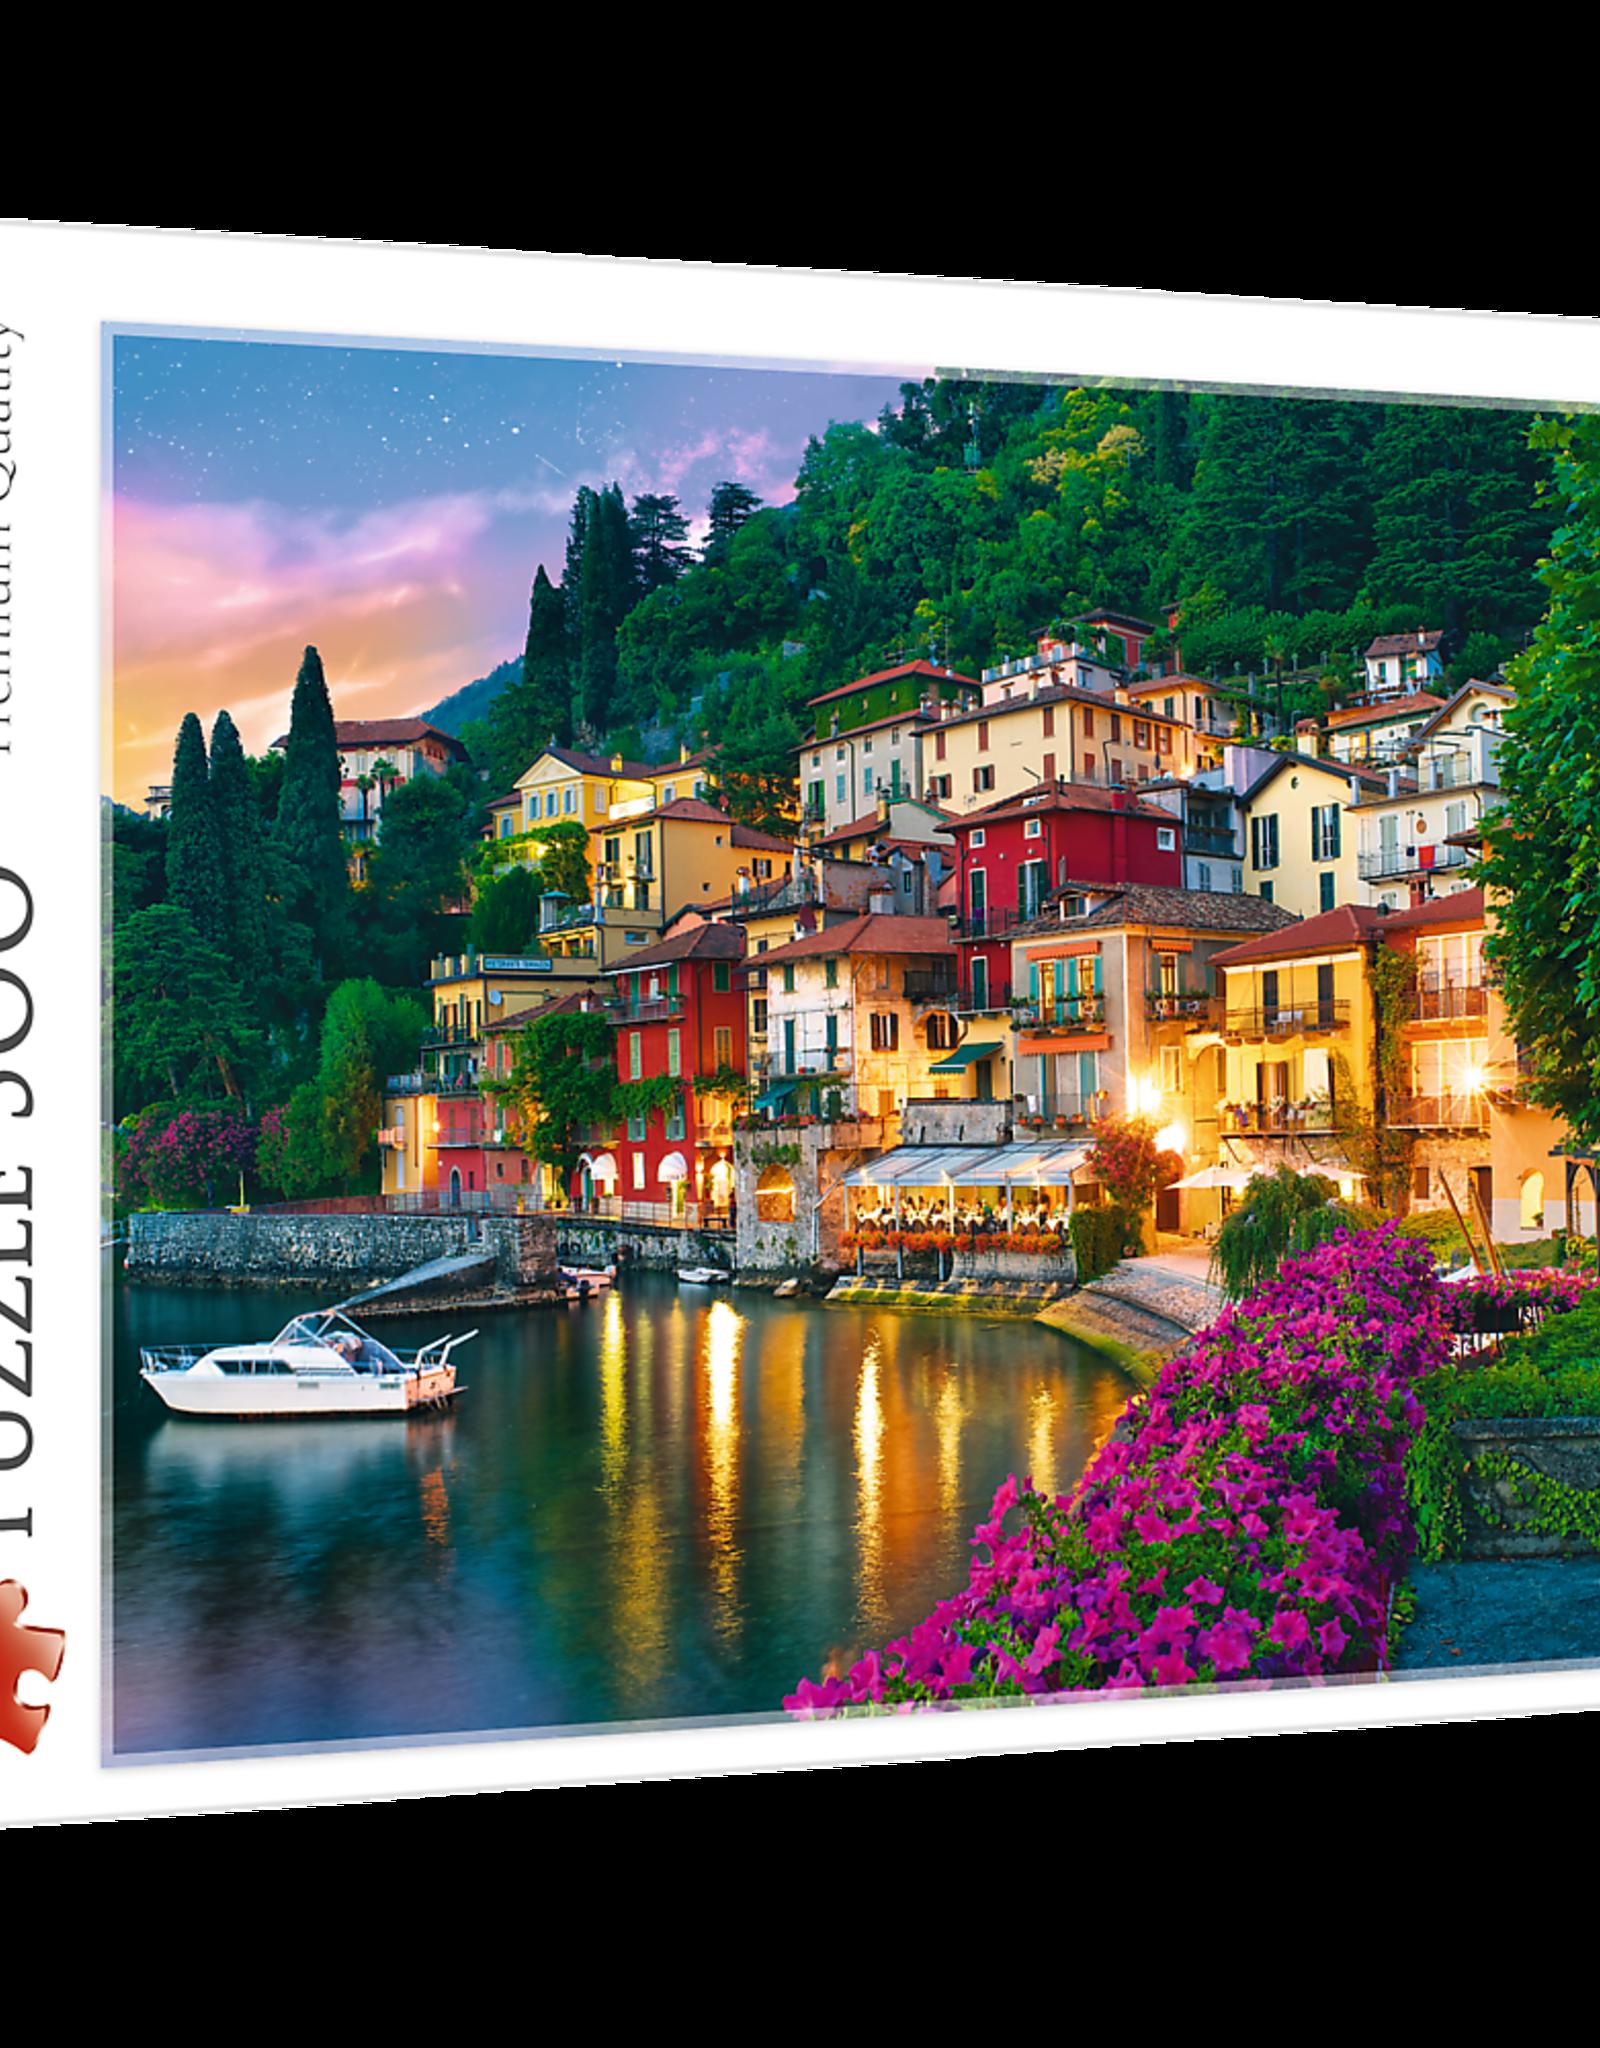 Trefl COMO LAKE, ITALY 500pc